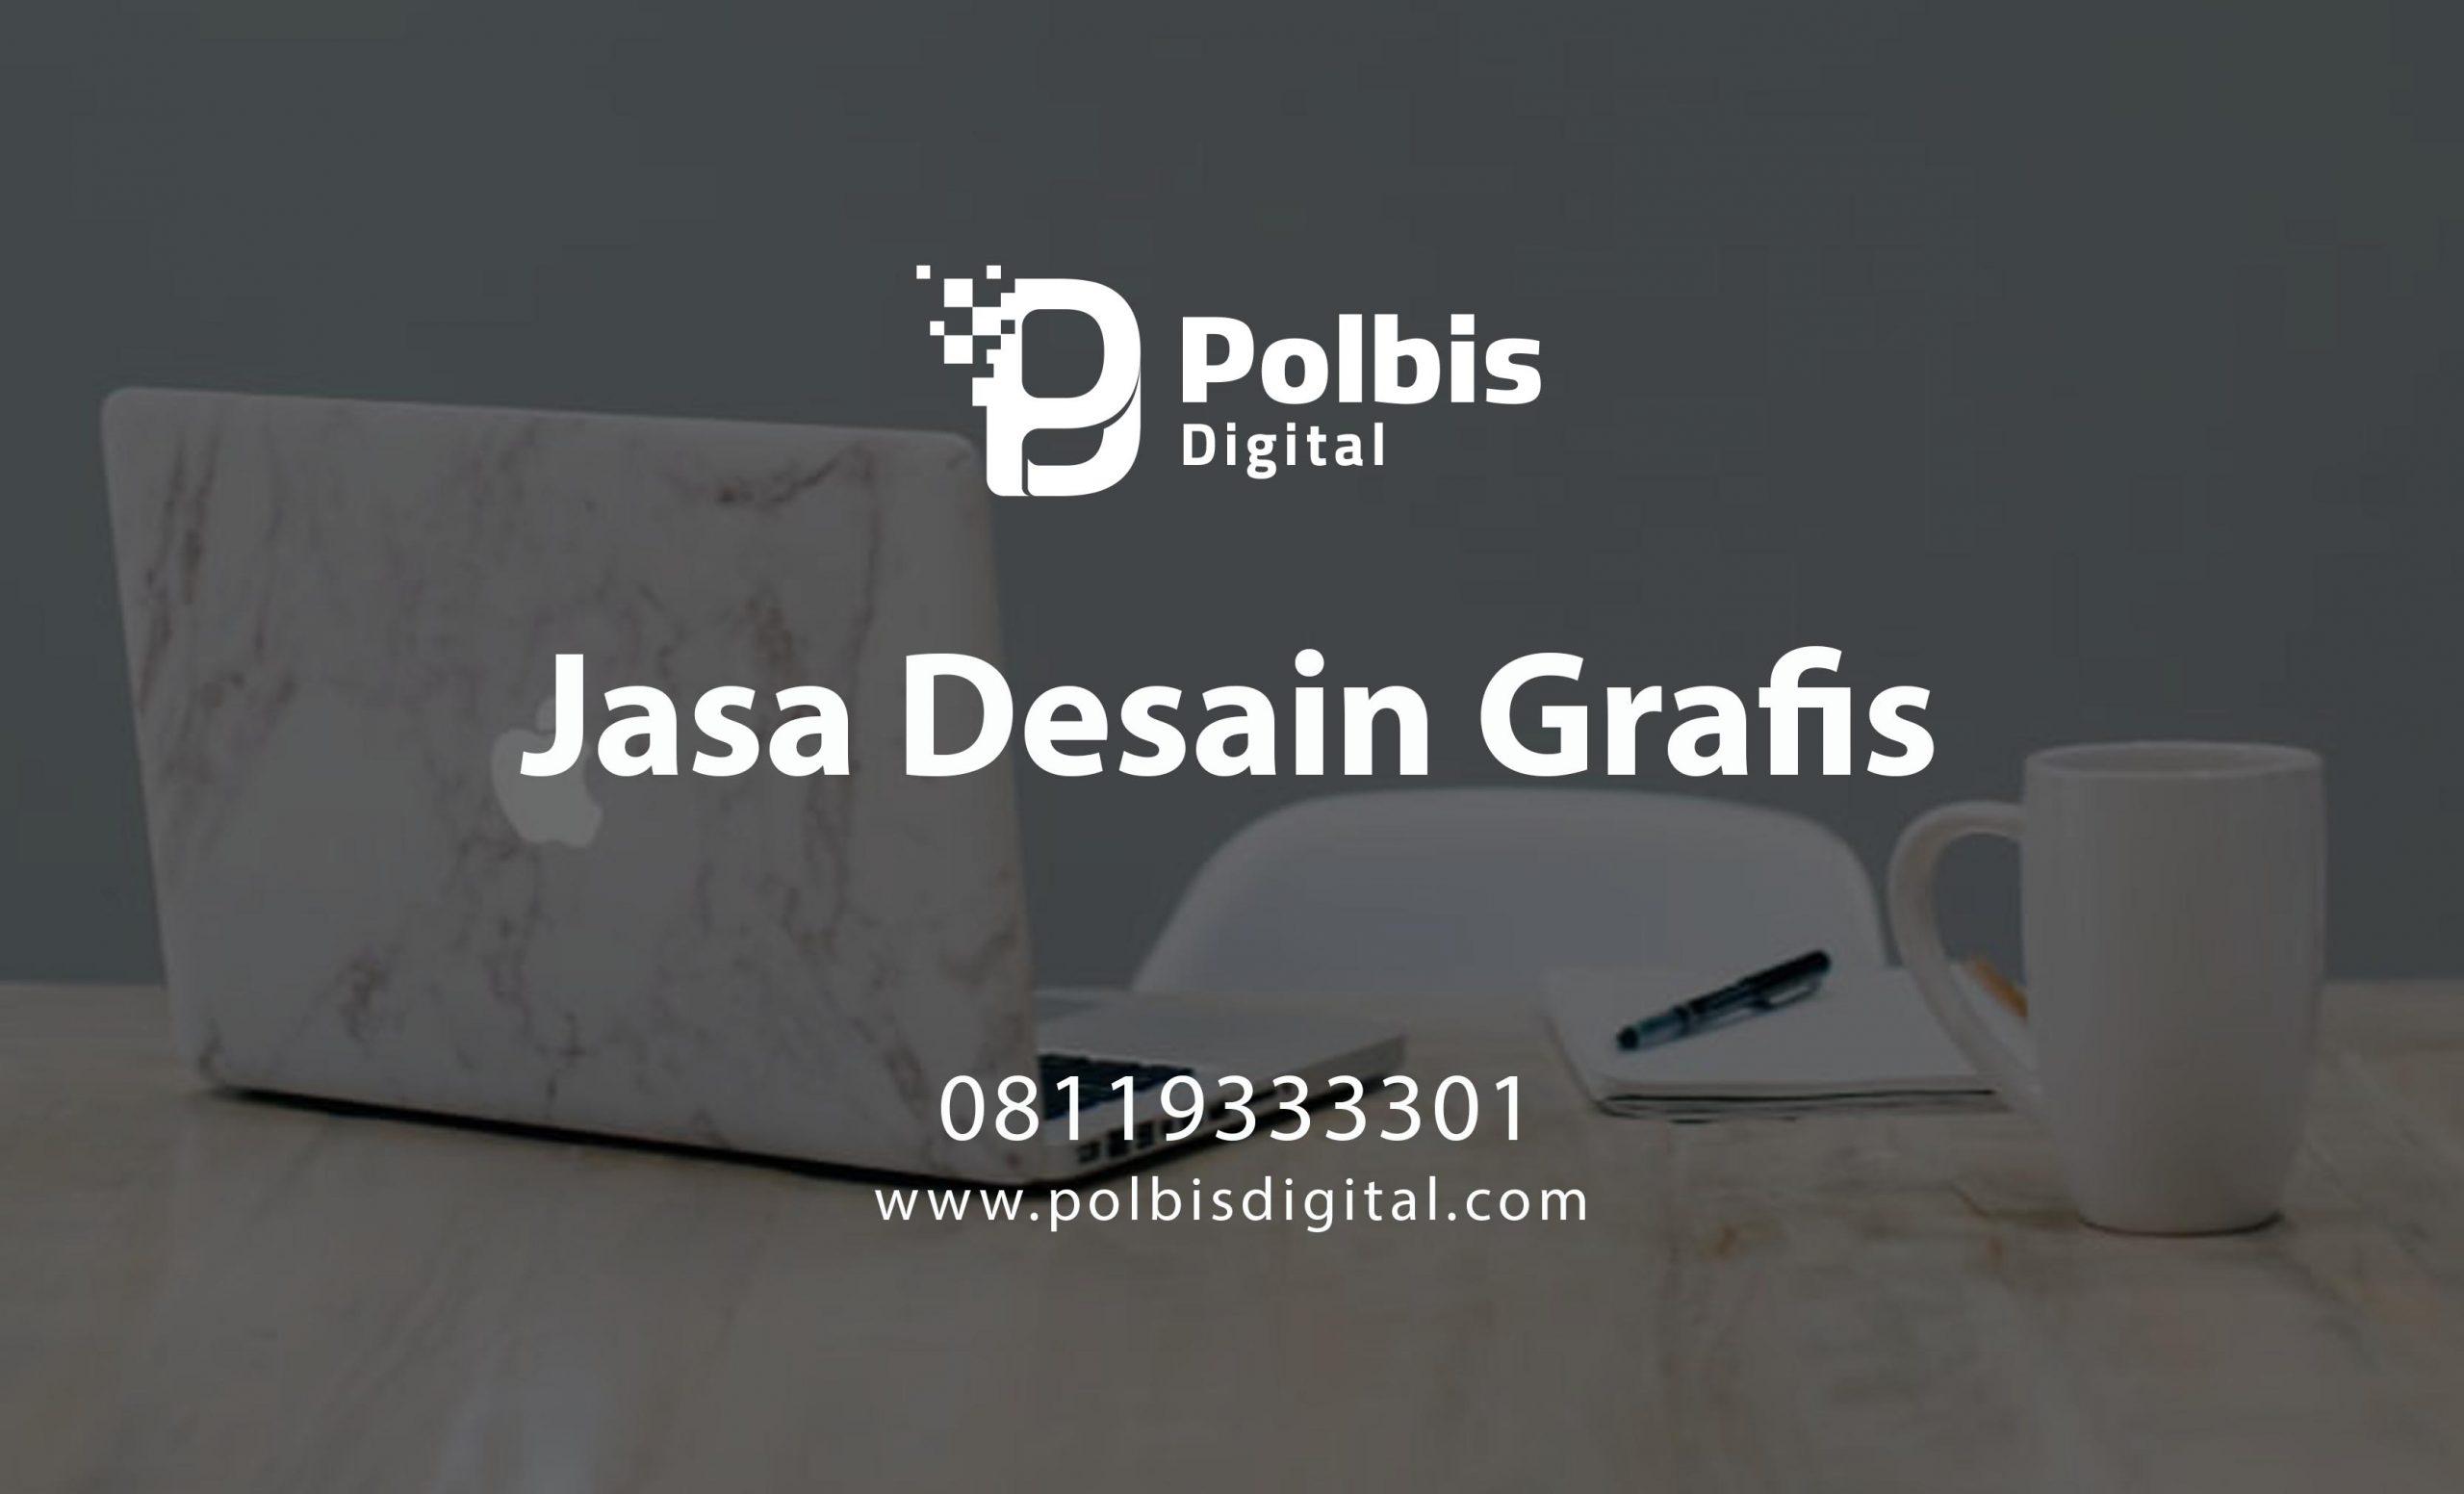 JASA DESAIN GRAFIS MAHAKAM ULU